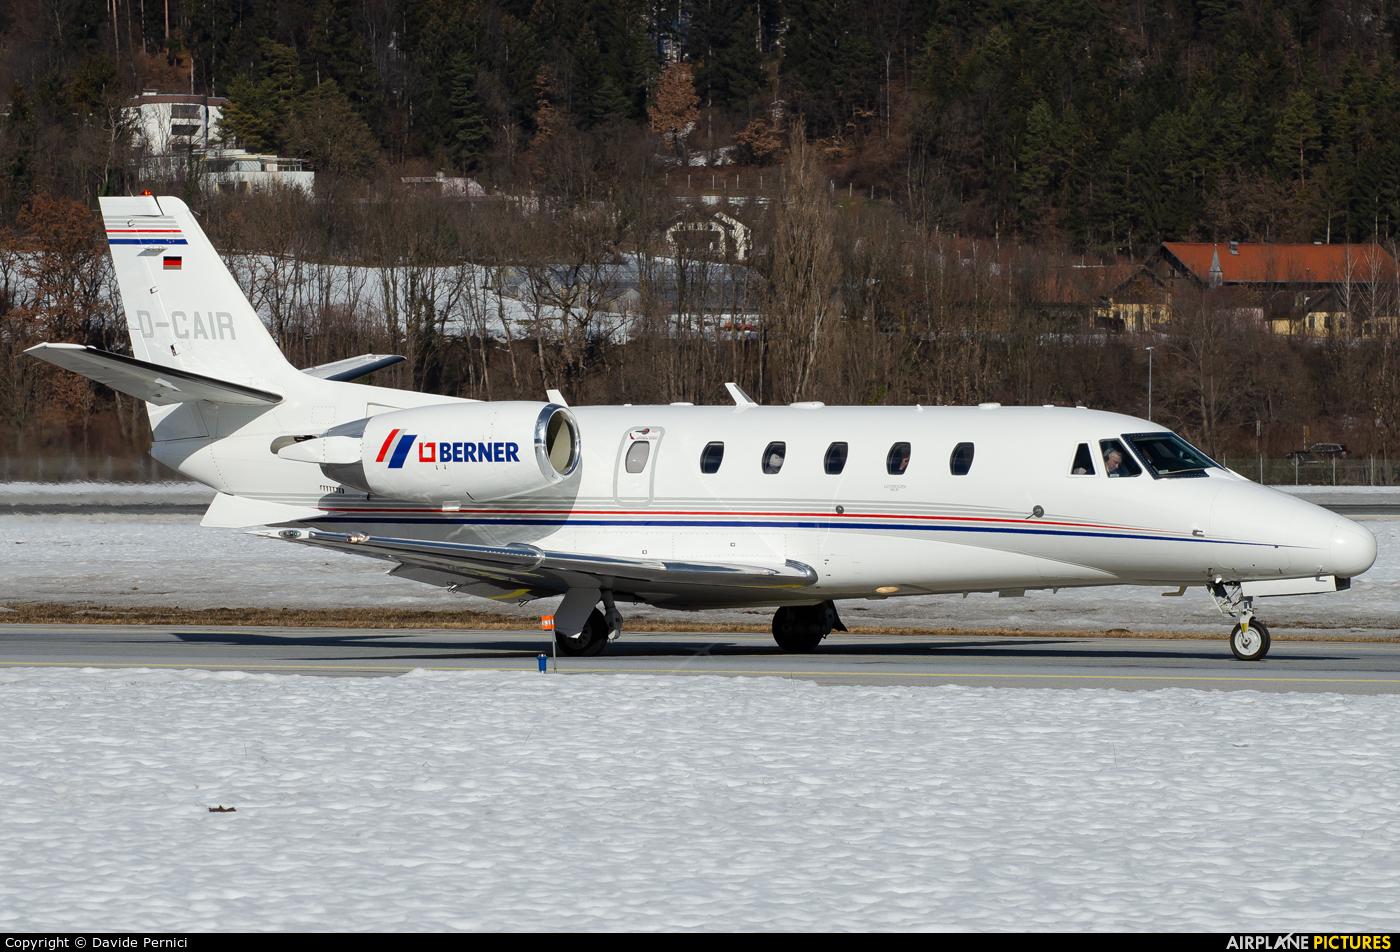 Private D-CAIR aircraft at Innsbruck